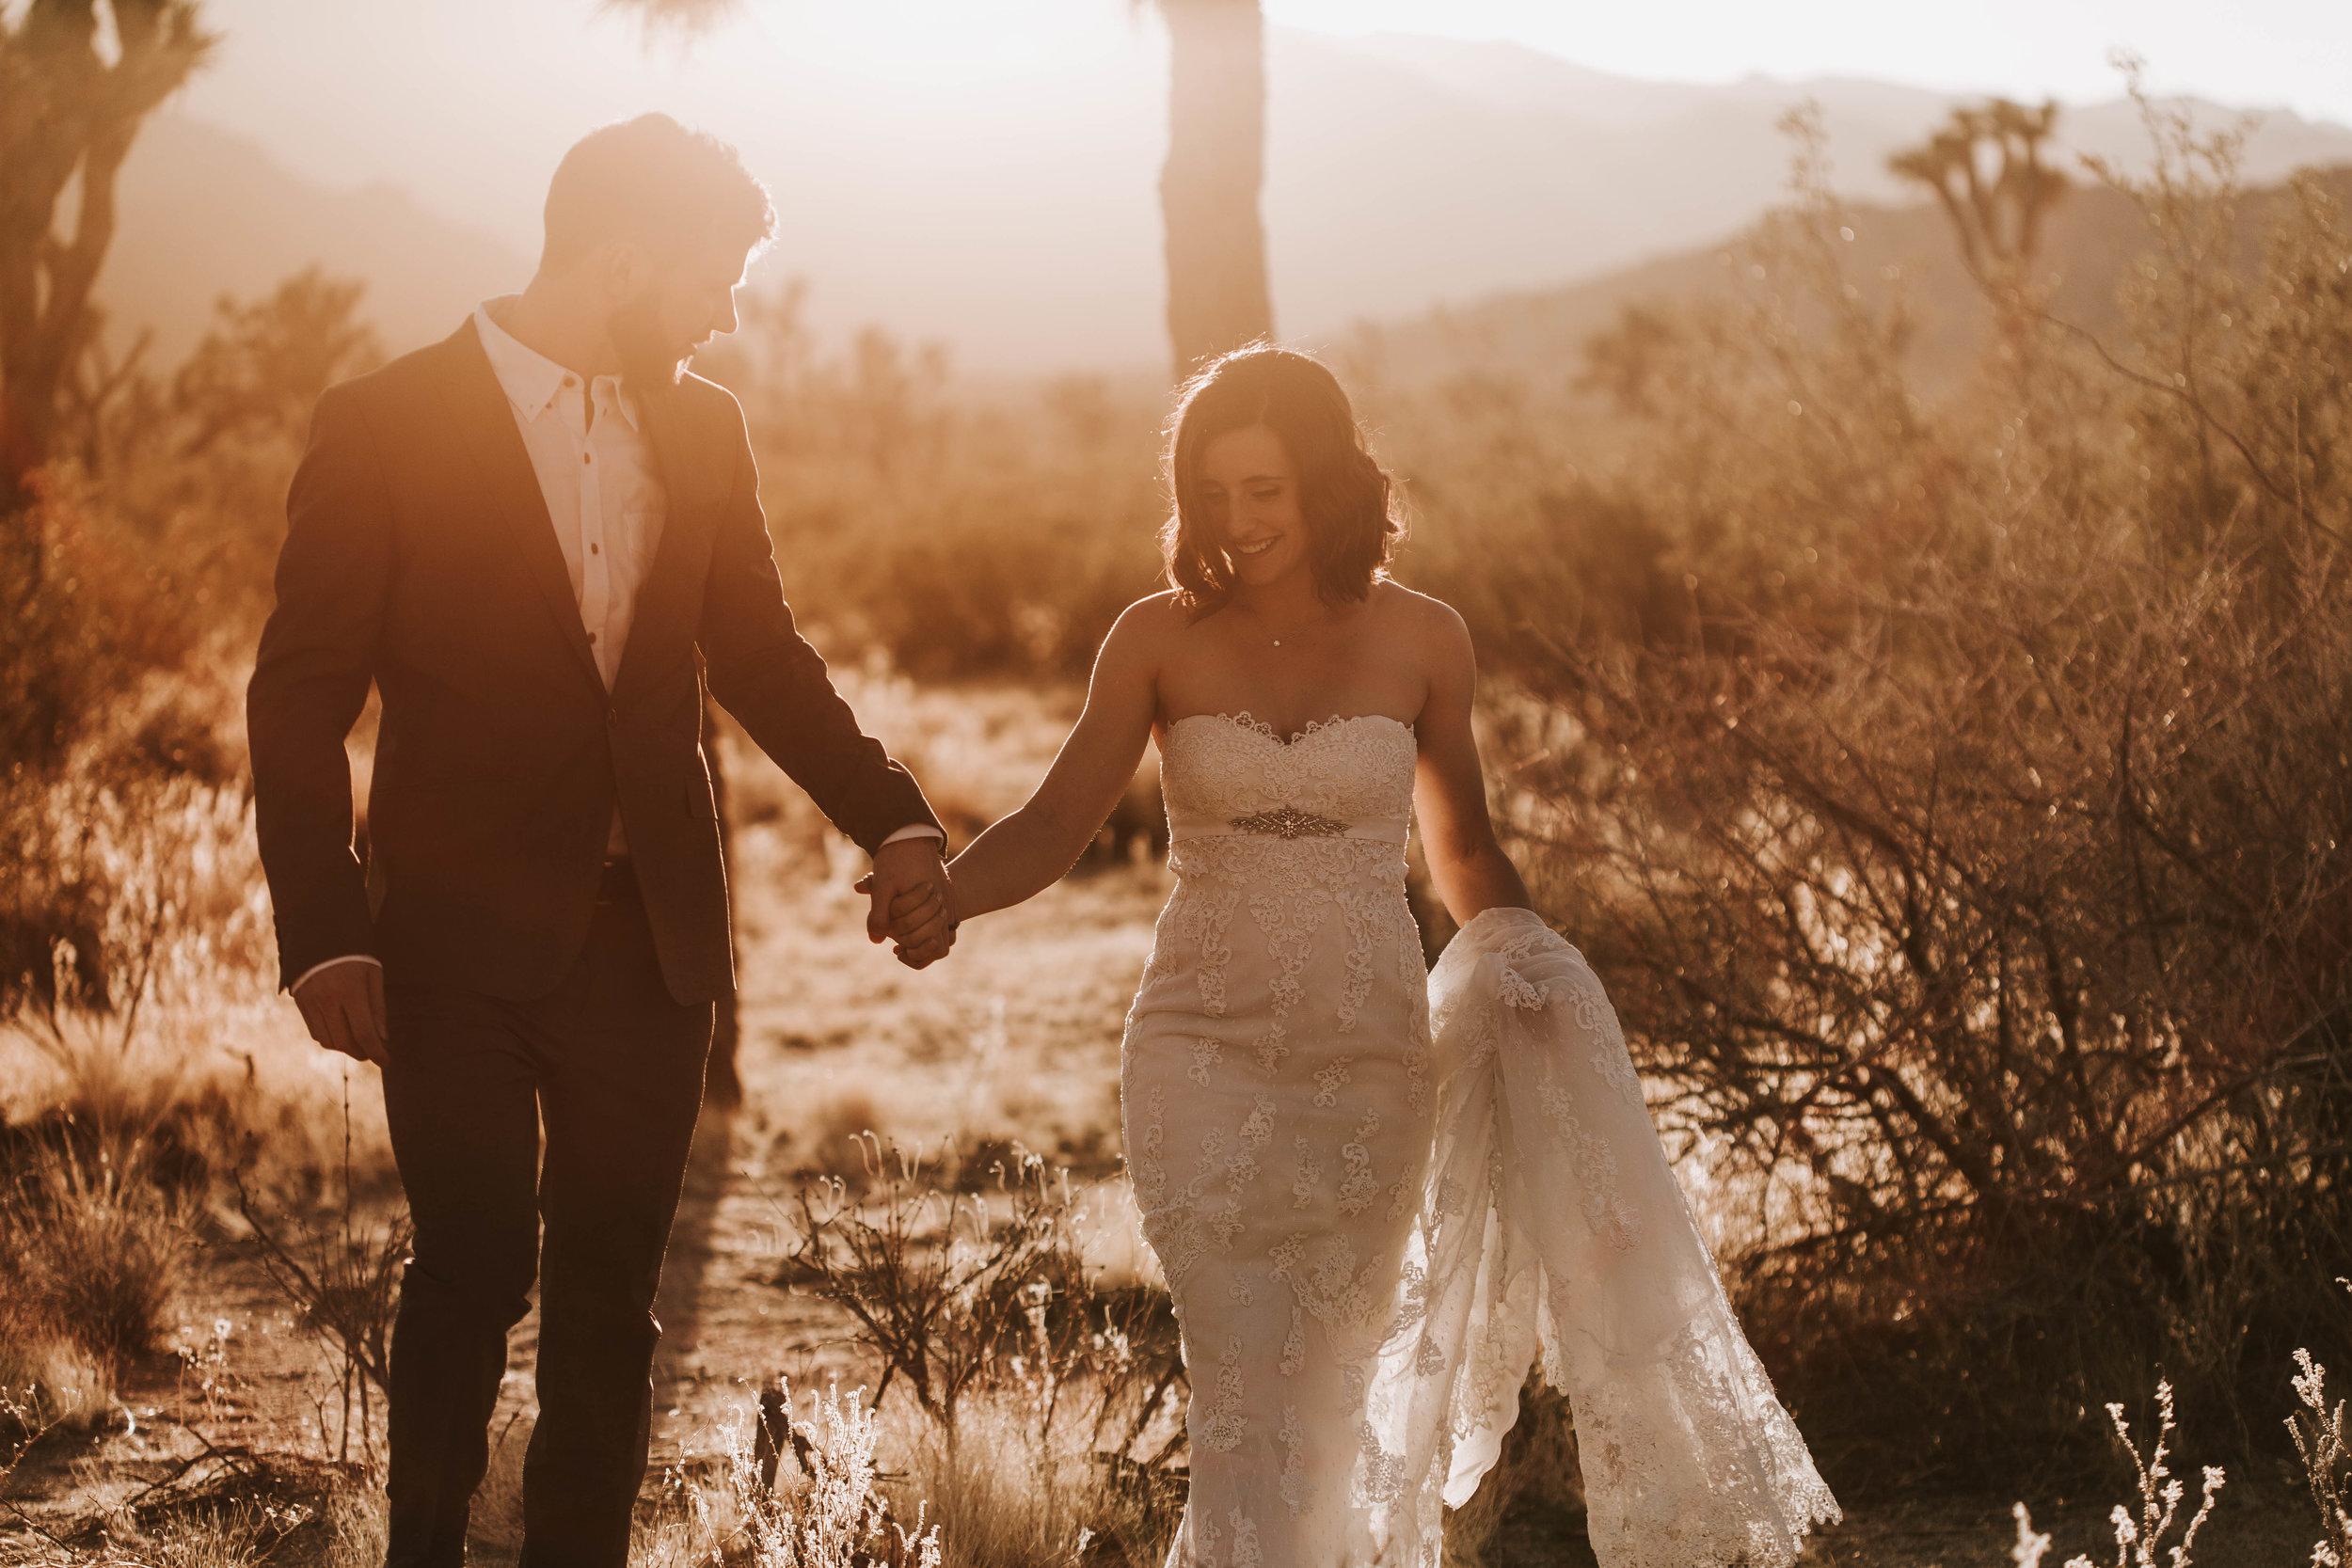 nicole-daacke-photography-joshua-tree-adventurous-elopement-wedding-national-park-wedding-photographer-adventure-wedding-adventurous-elopement-jtree-joshua-tree-national-park-wedding-photographer-intimate-weddings-golden-desert-love-16.jpg